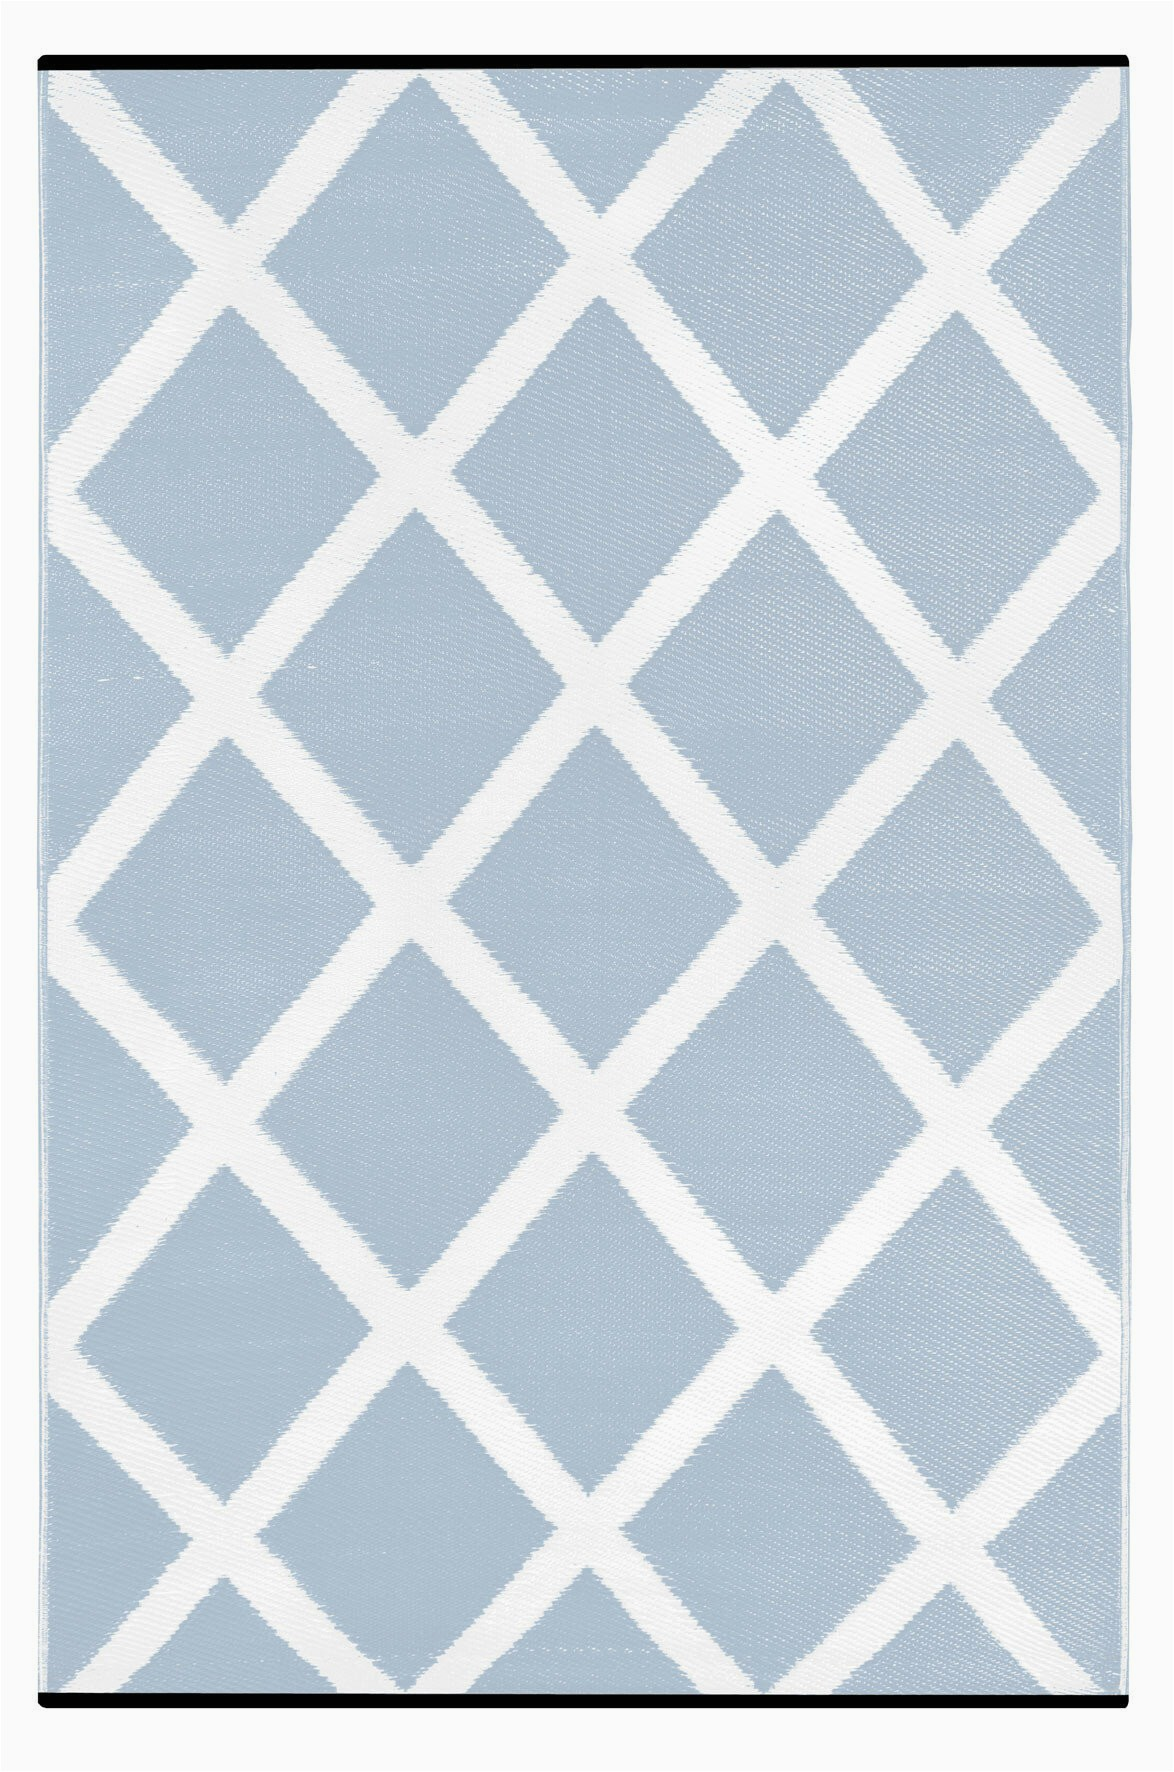 Wayfair Rugs Blue and White Lightweight Reversible Diamond Light Blue White Indoor Outdoor area Rug